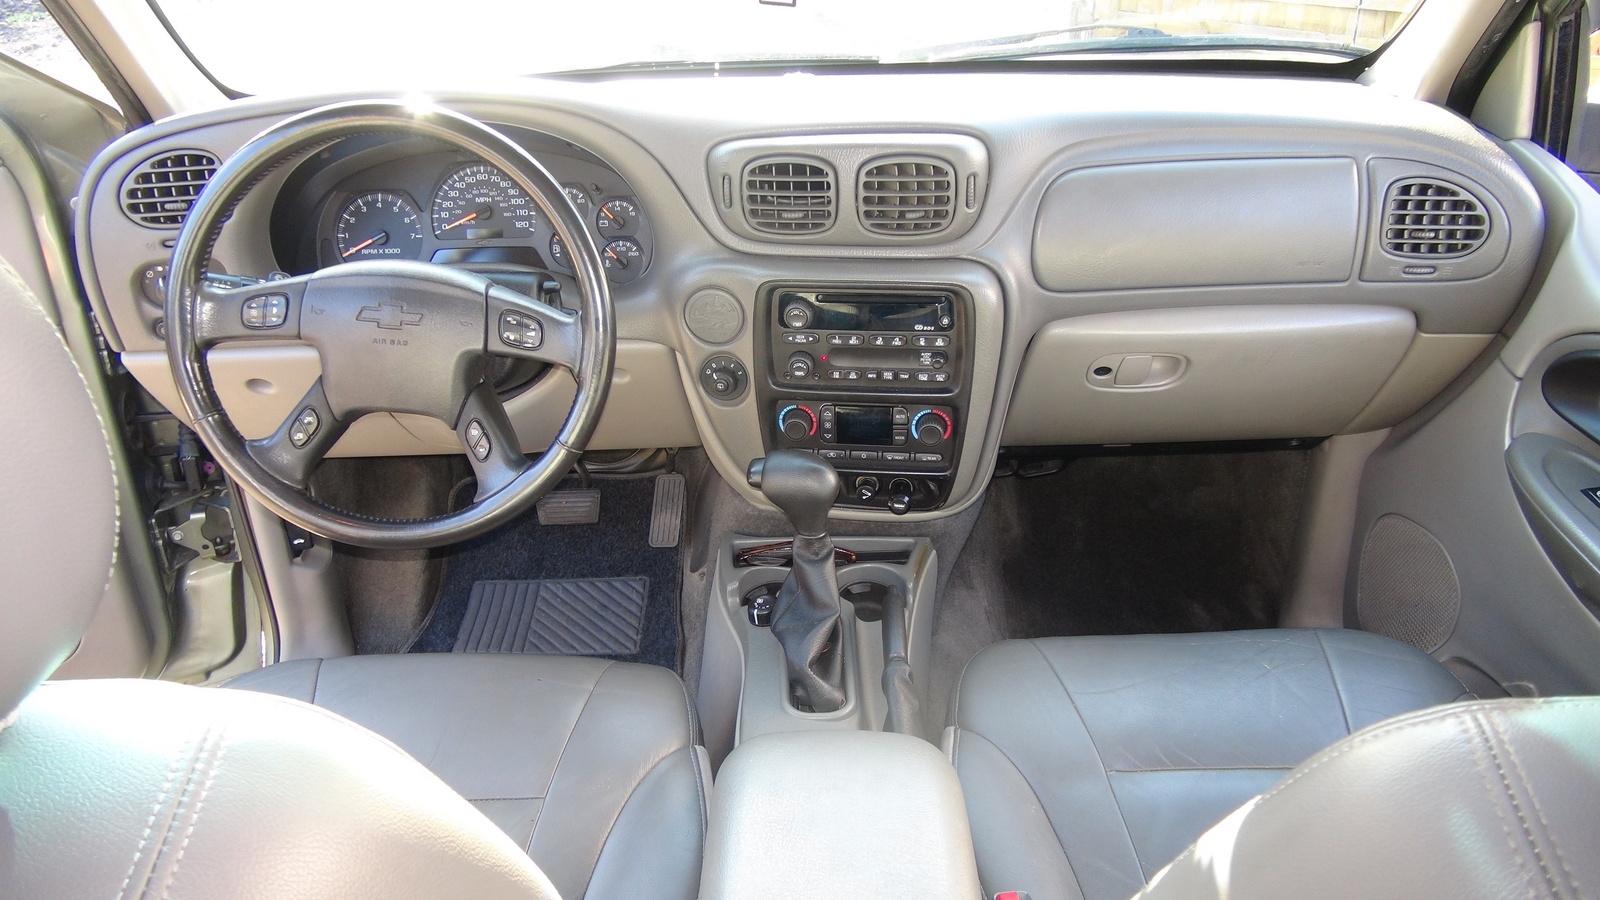 2003 Chevrolet TrailBlazer EXT - Pictures - CarGurus